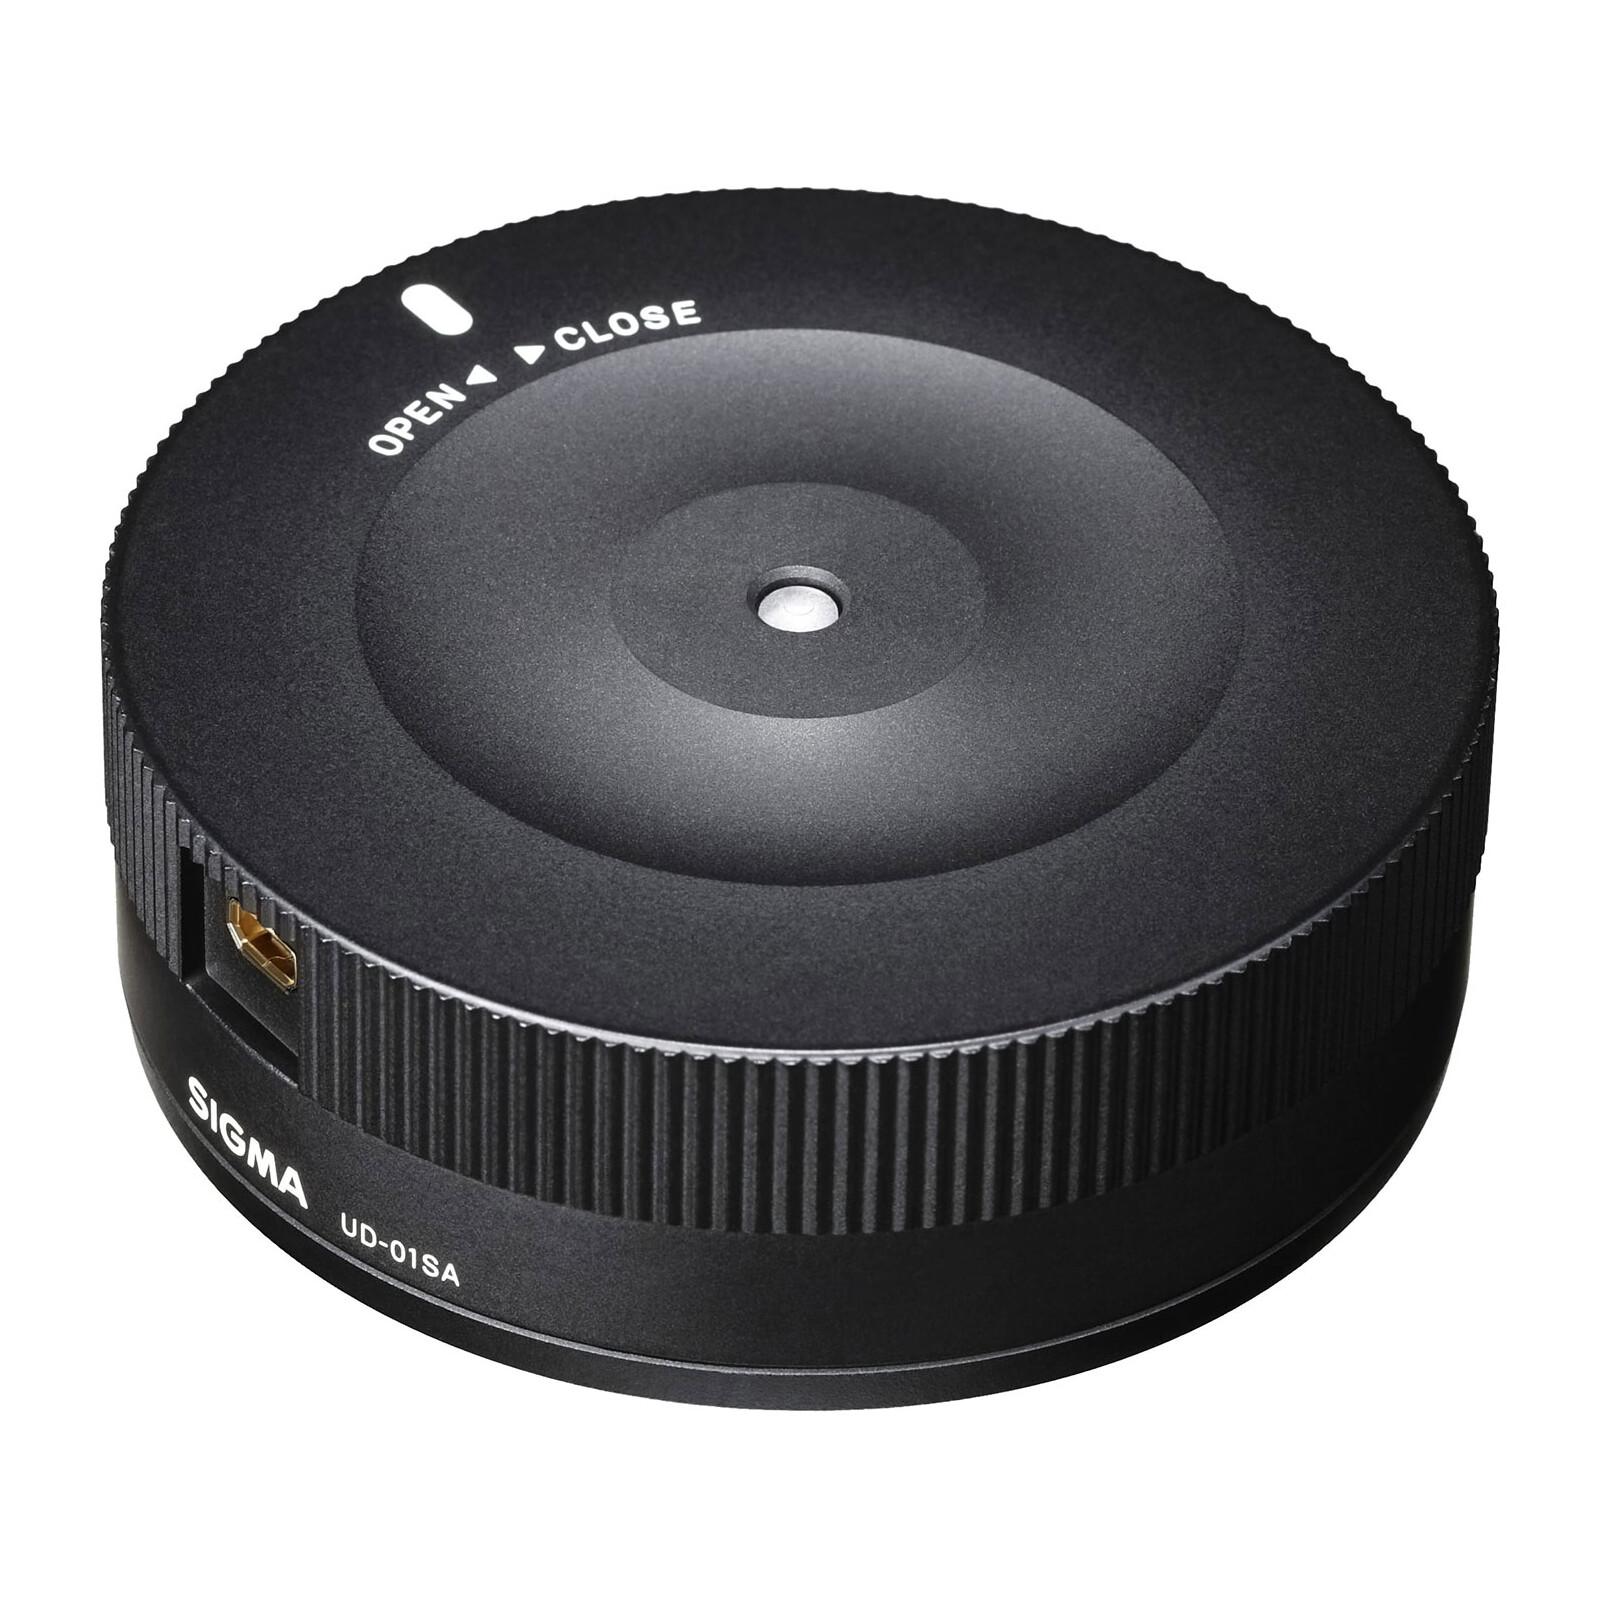 Sigma USB Dock Canon M-Mount